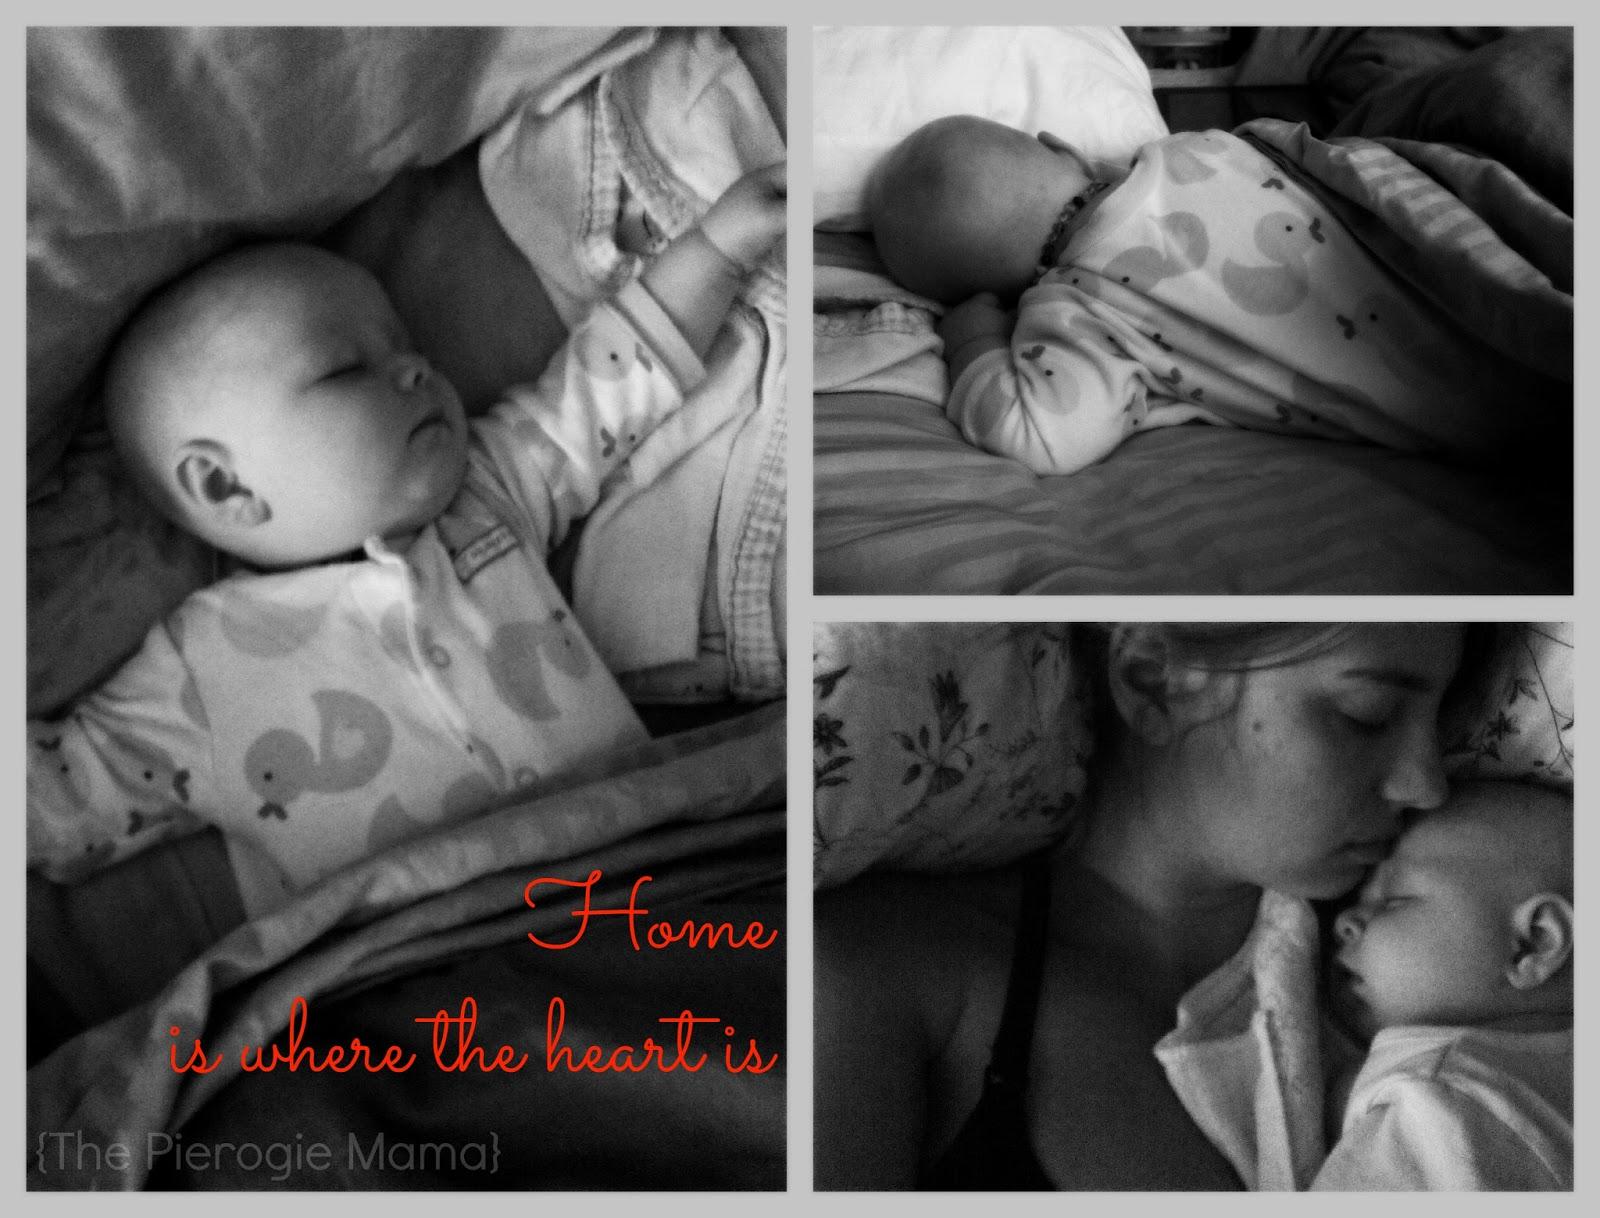 The Pierogie Mama Bed Sharing